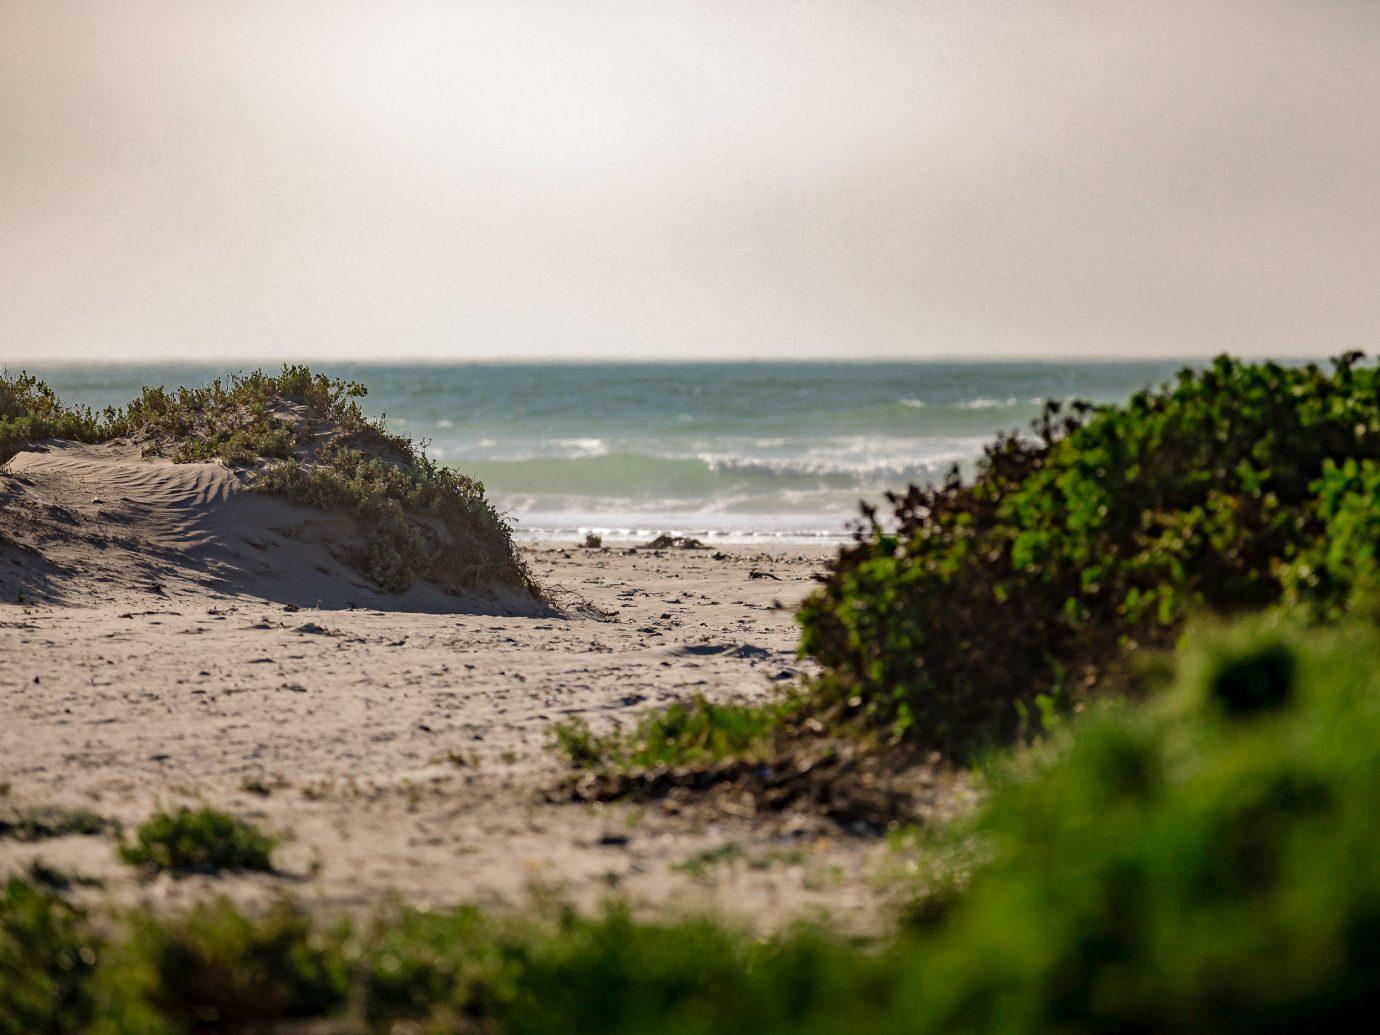 Trip Ideas outdoor body of water Sea Nature sky shore Coast Beach water Ocean tree sand grass horizon landscape rock